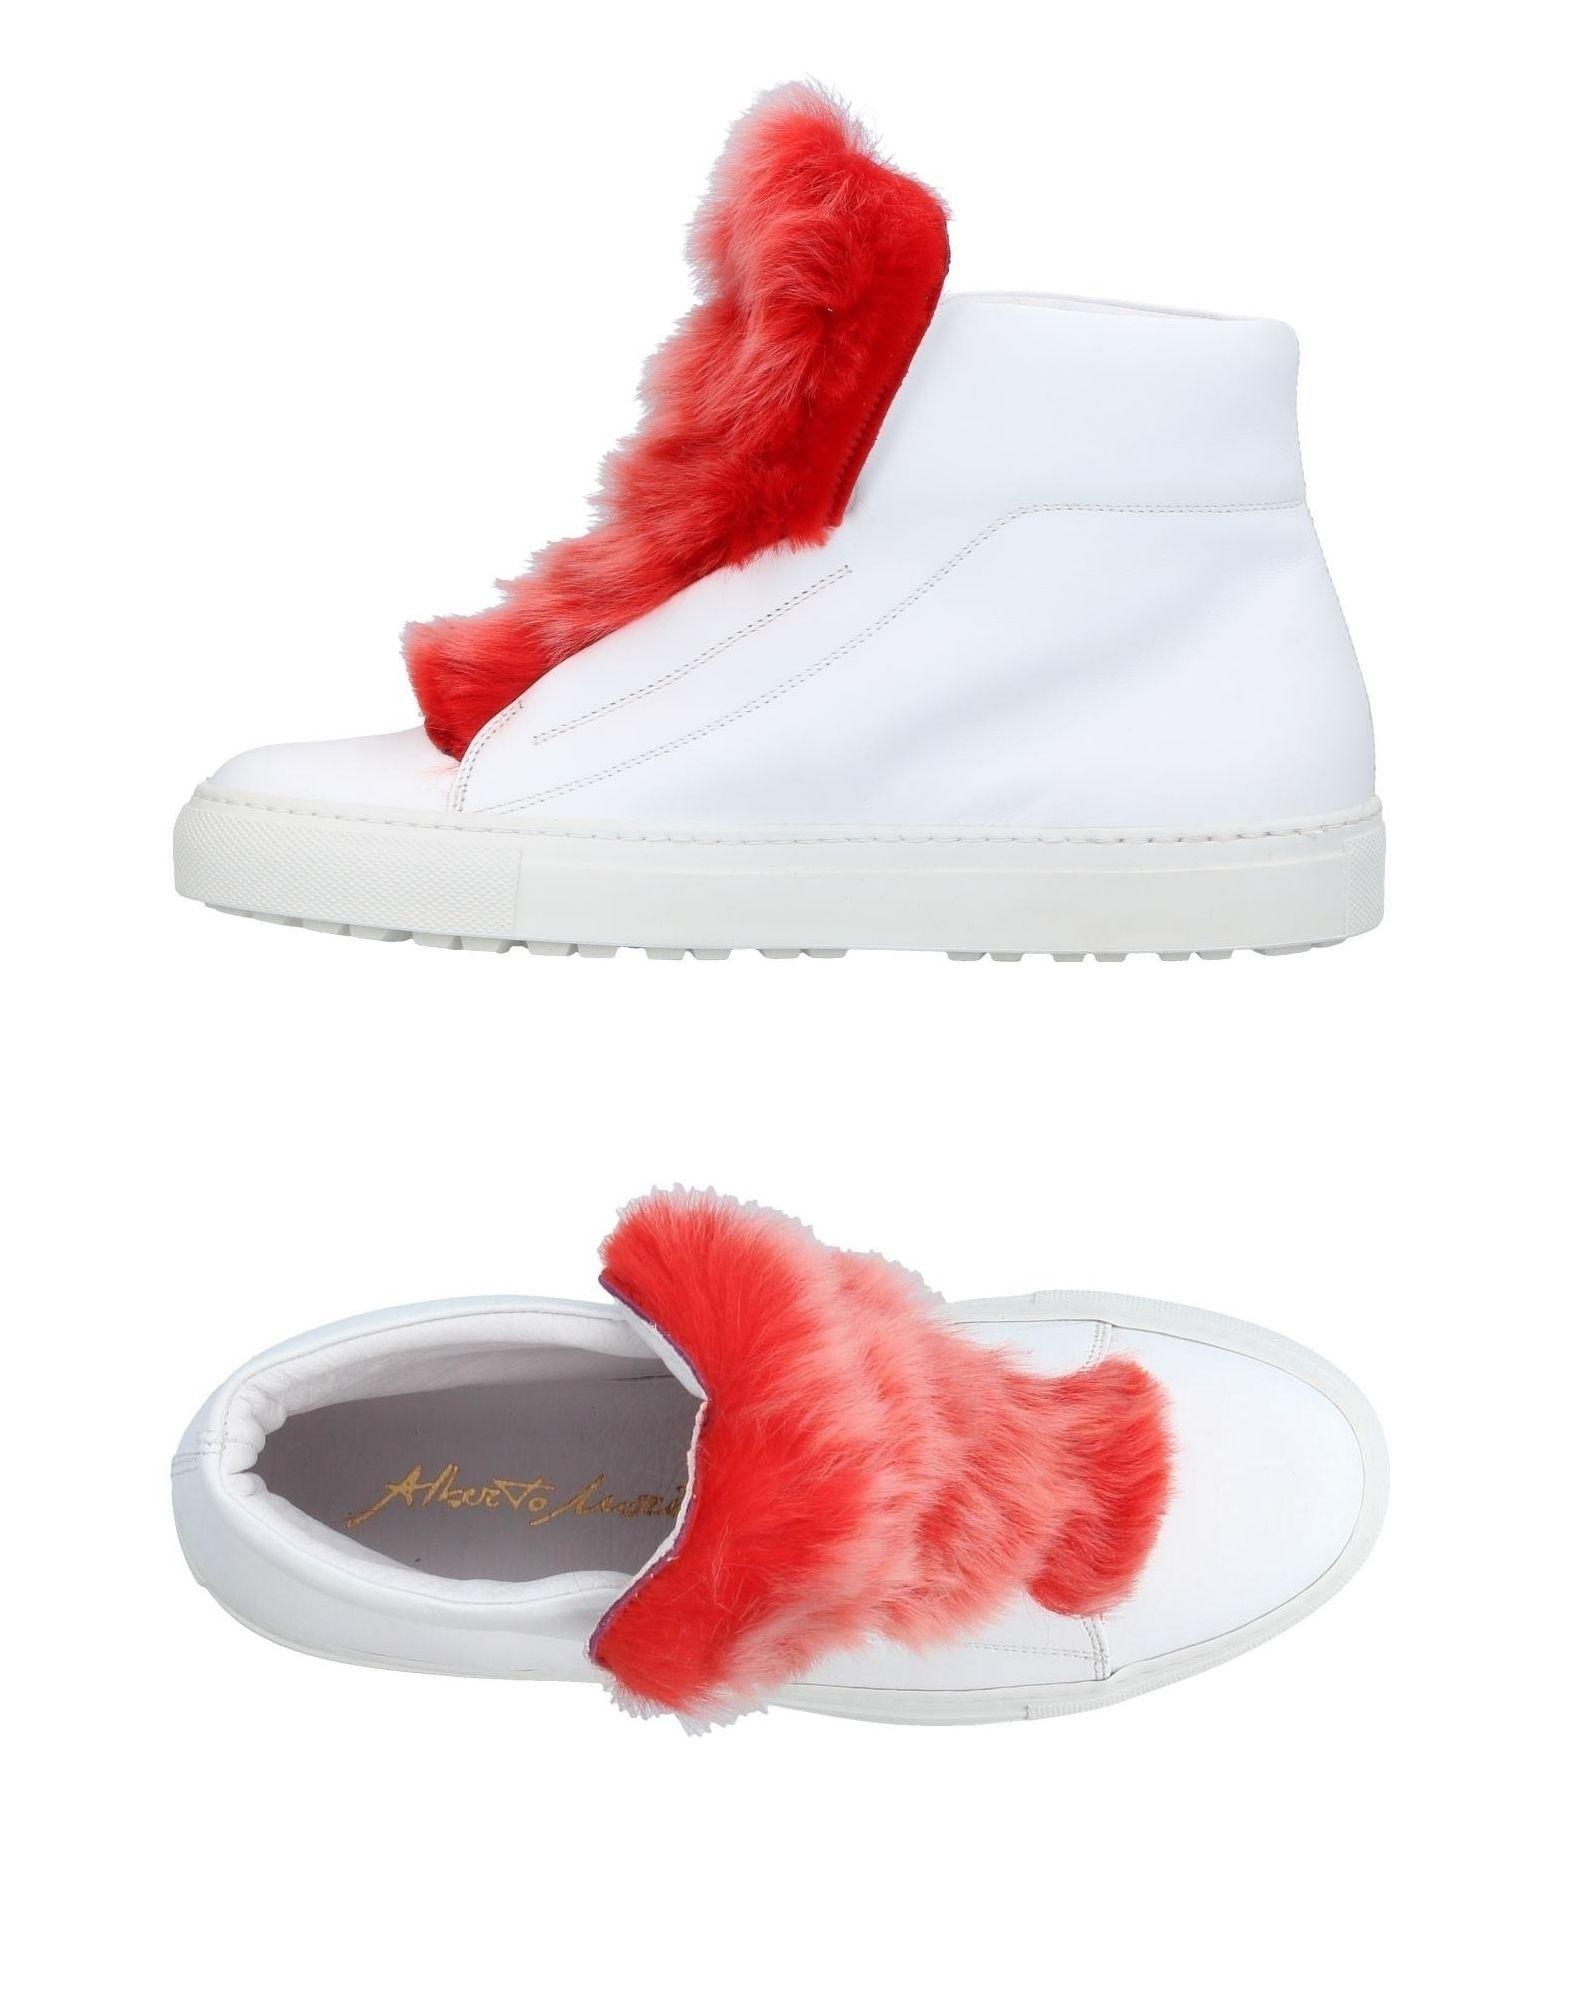 ALBERTO MORETTI Damen High Sneakers & Tennisschuhe Farbe Weiß Größe 9 jetztbilligerkaufen